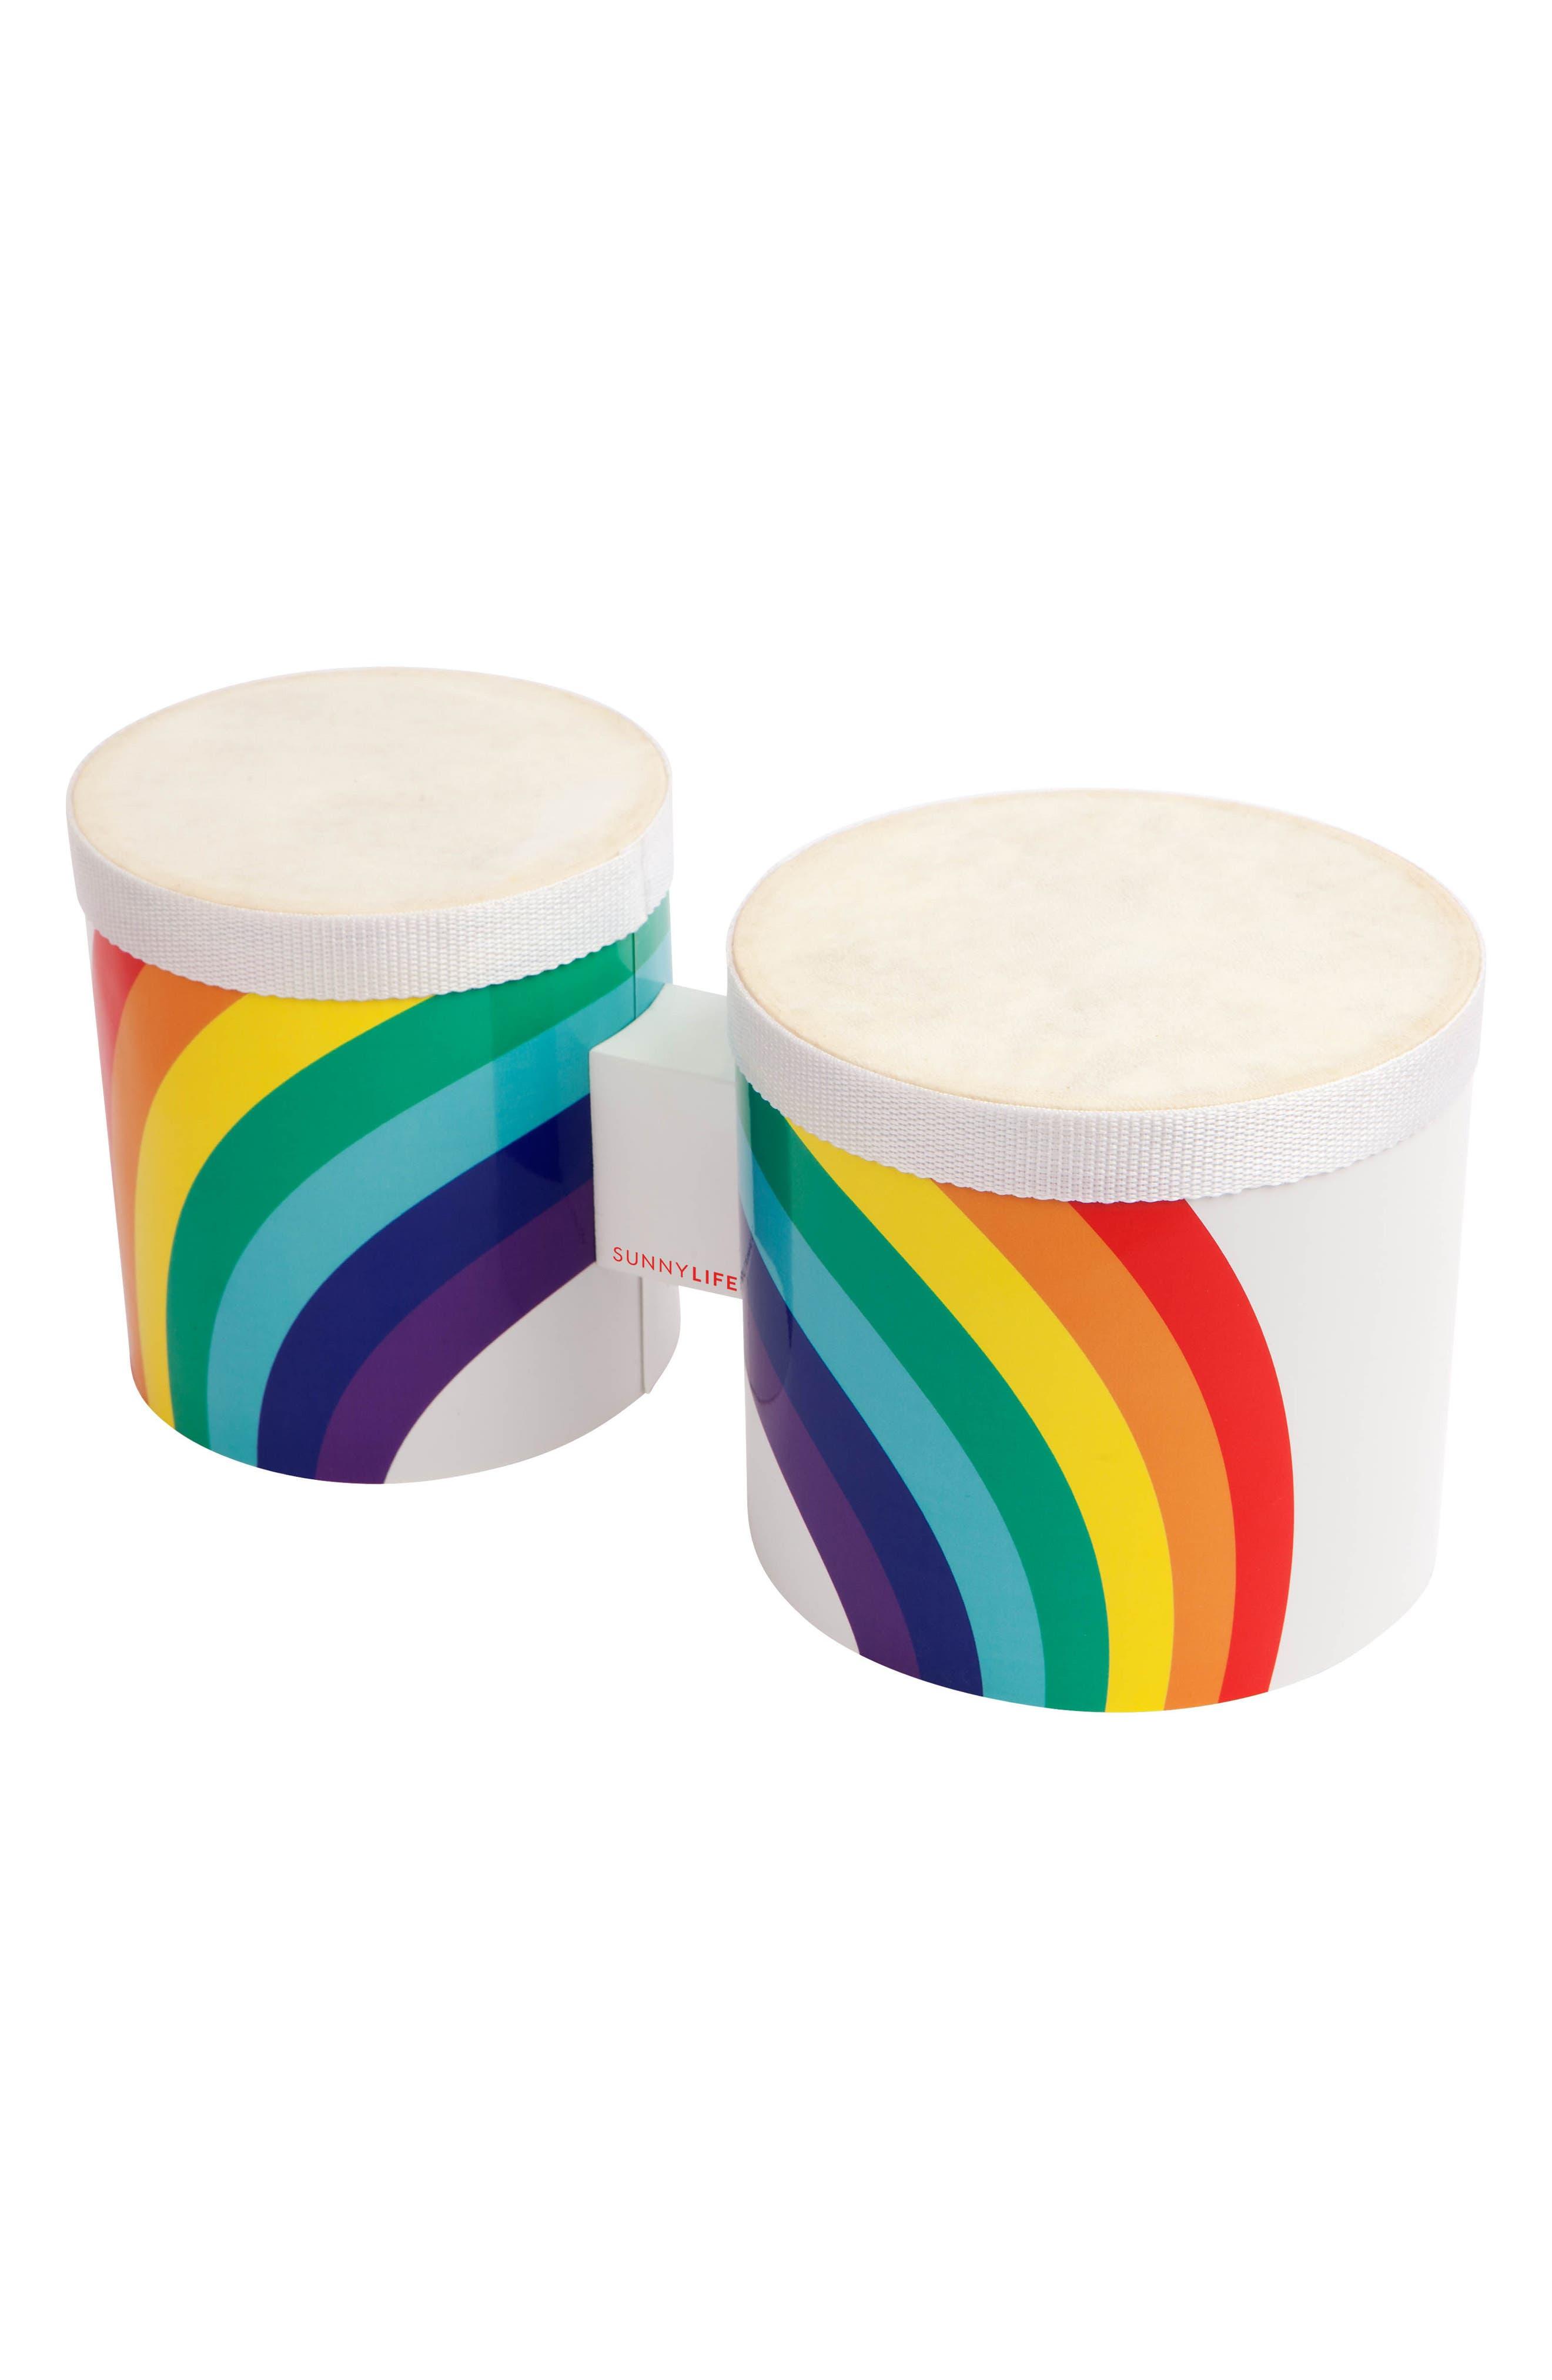 Rainbow Bongo Drums,                         Main,                         color, Multi